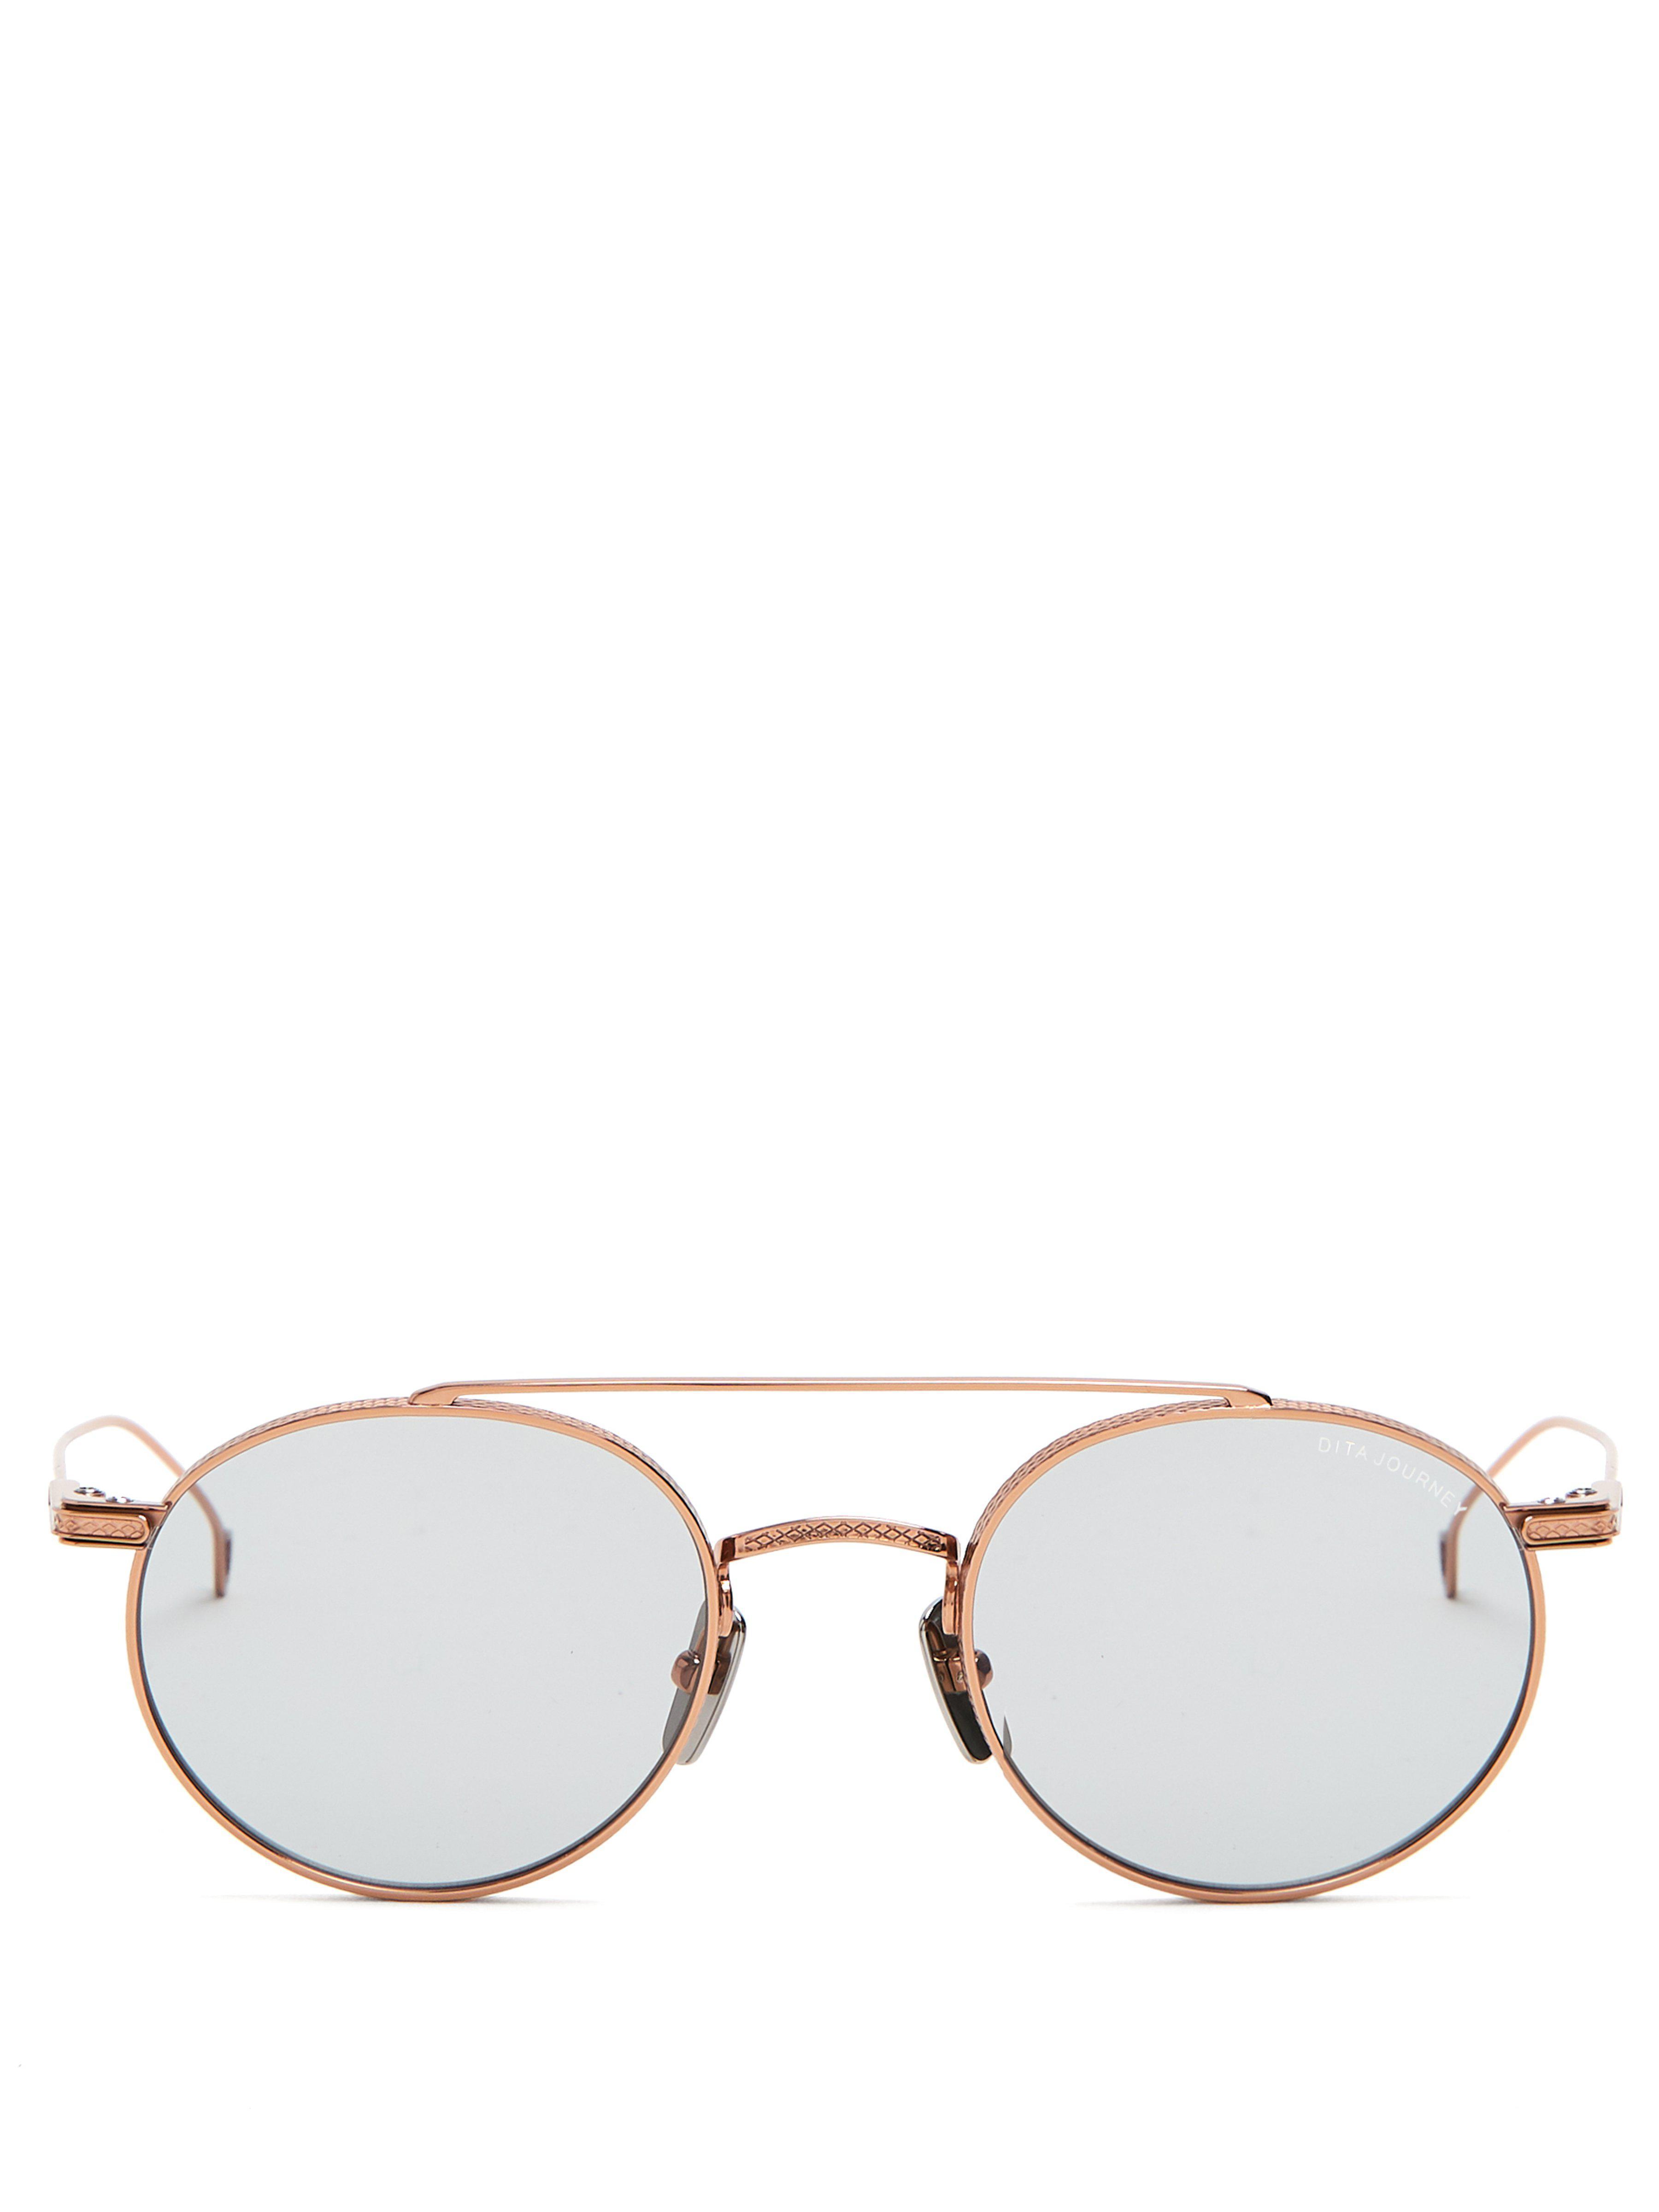 41701be5419 Dita Eyewear Journey Round Frame Sunglasses in Metallic for Men - Lyst